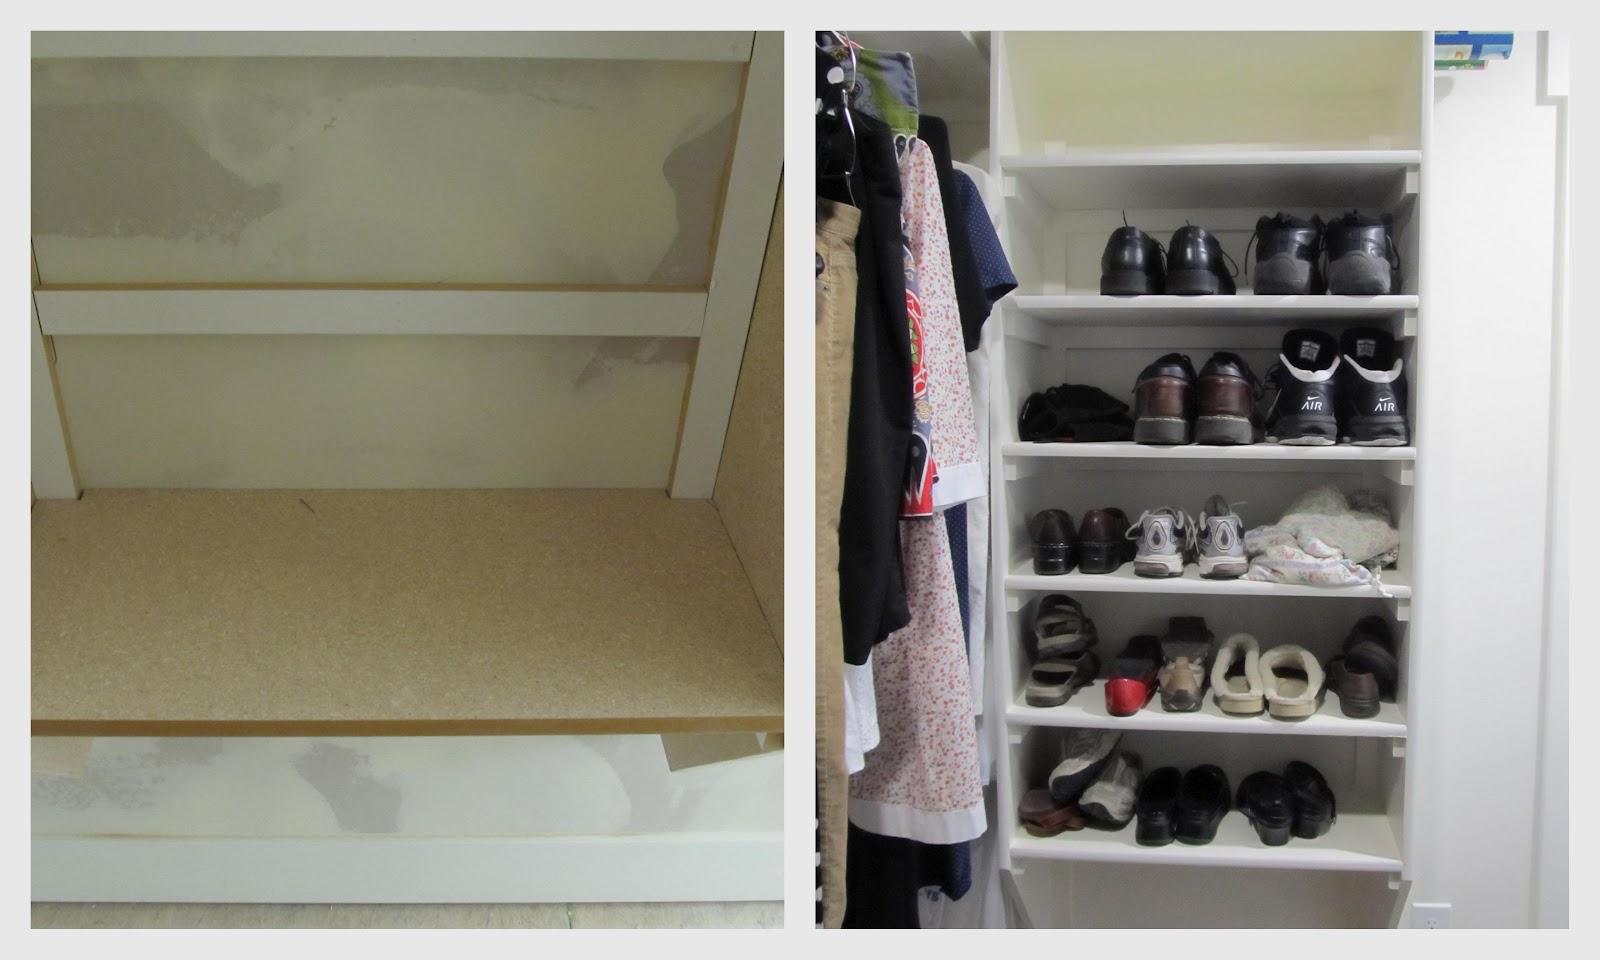 Pickup Some Creativity Tips For DIY Closet Shelving